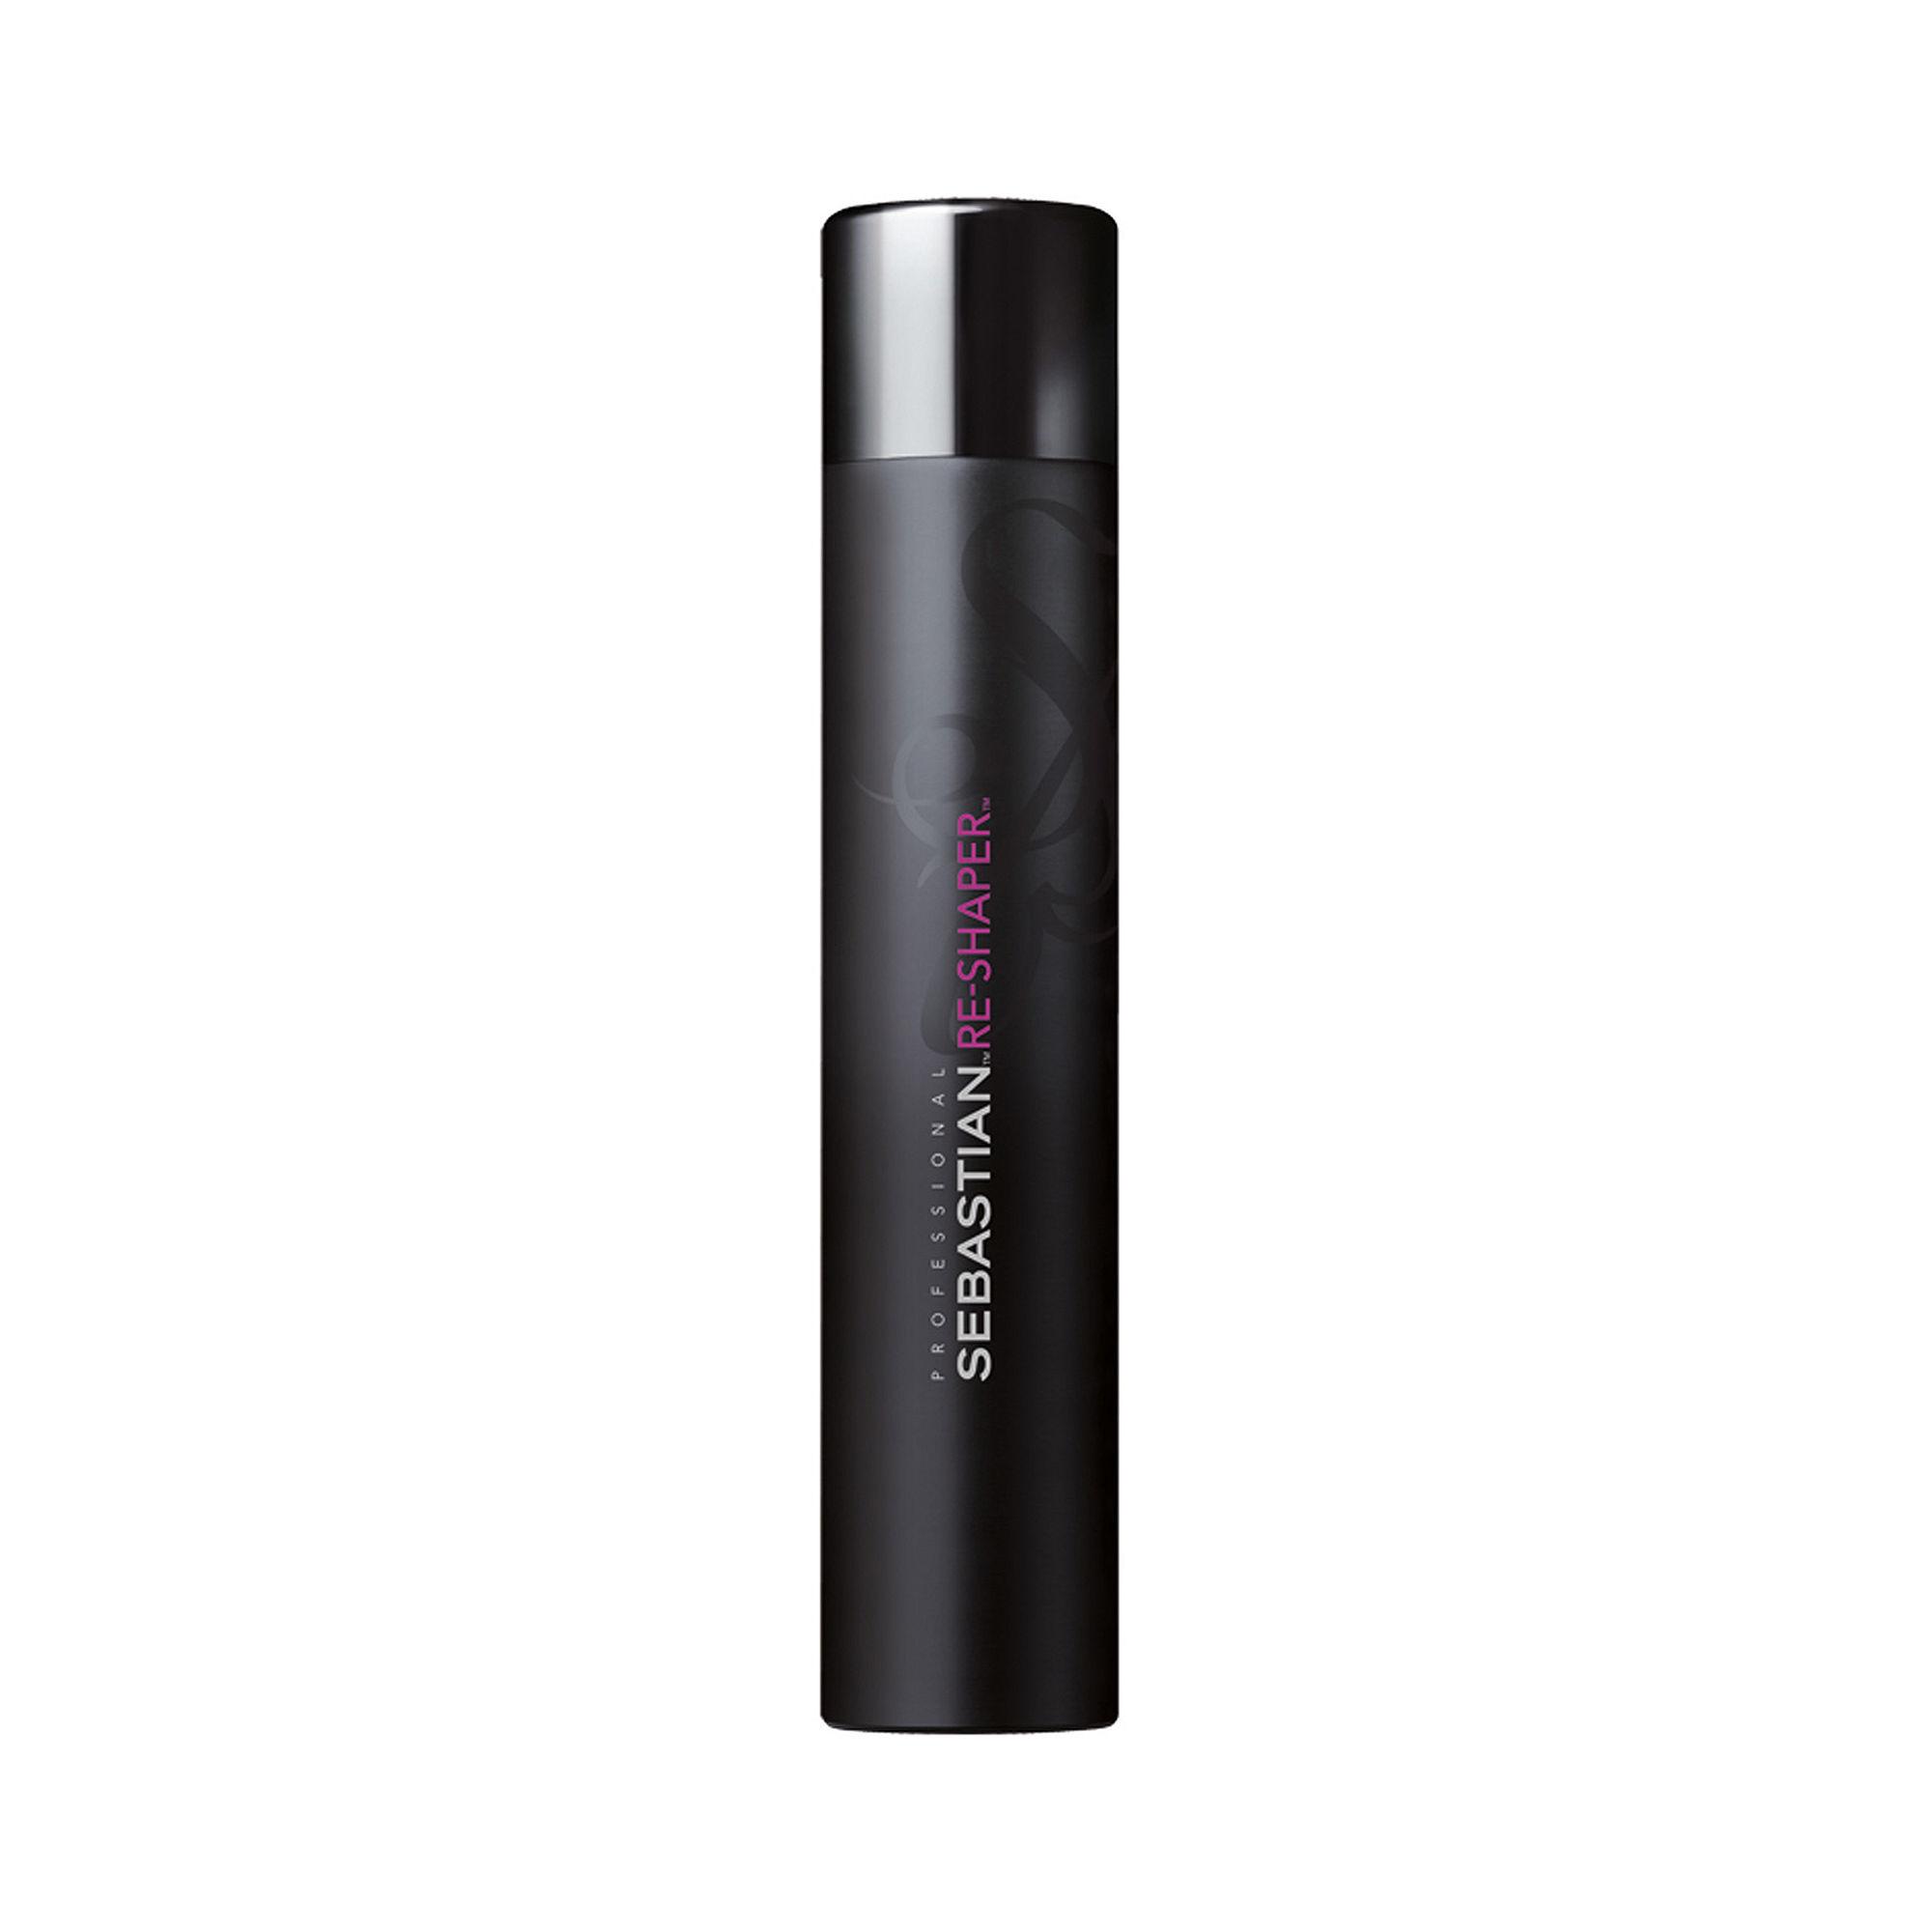 Sebastian Re-Shaper Hairspray - 10.6 oz.